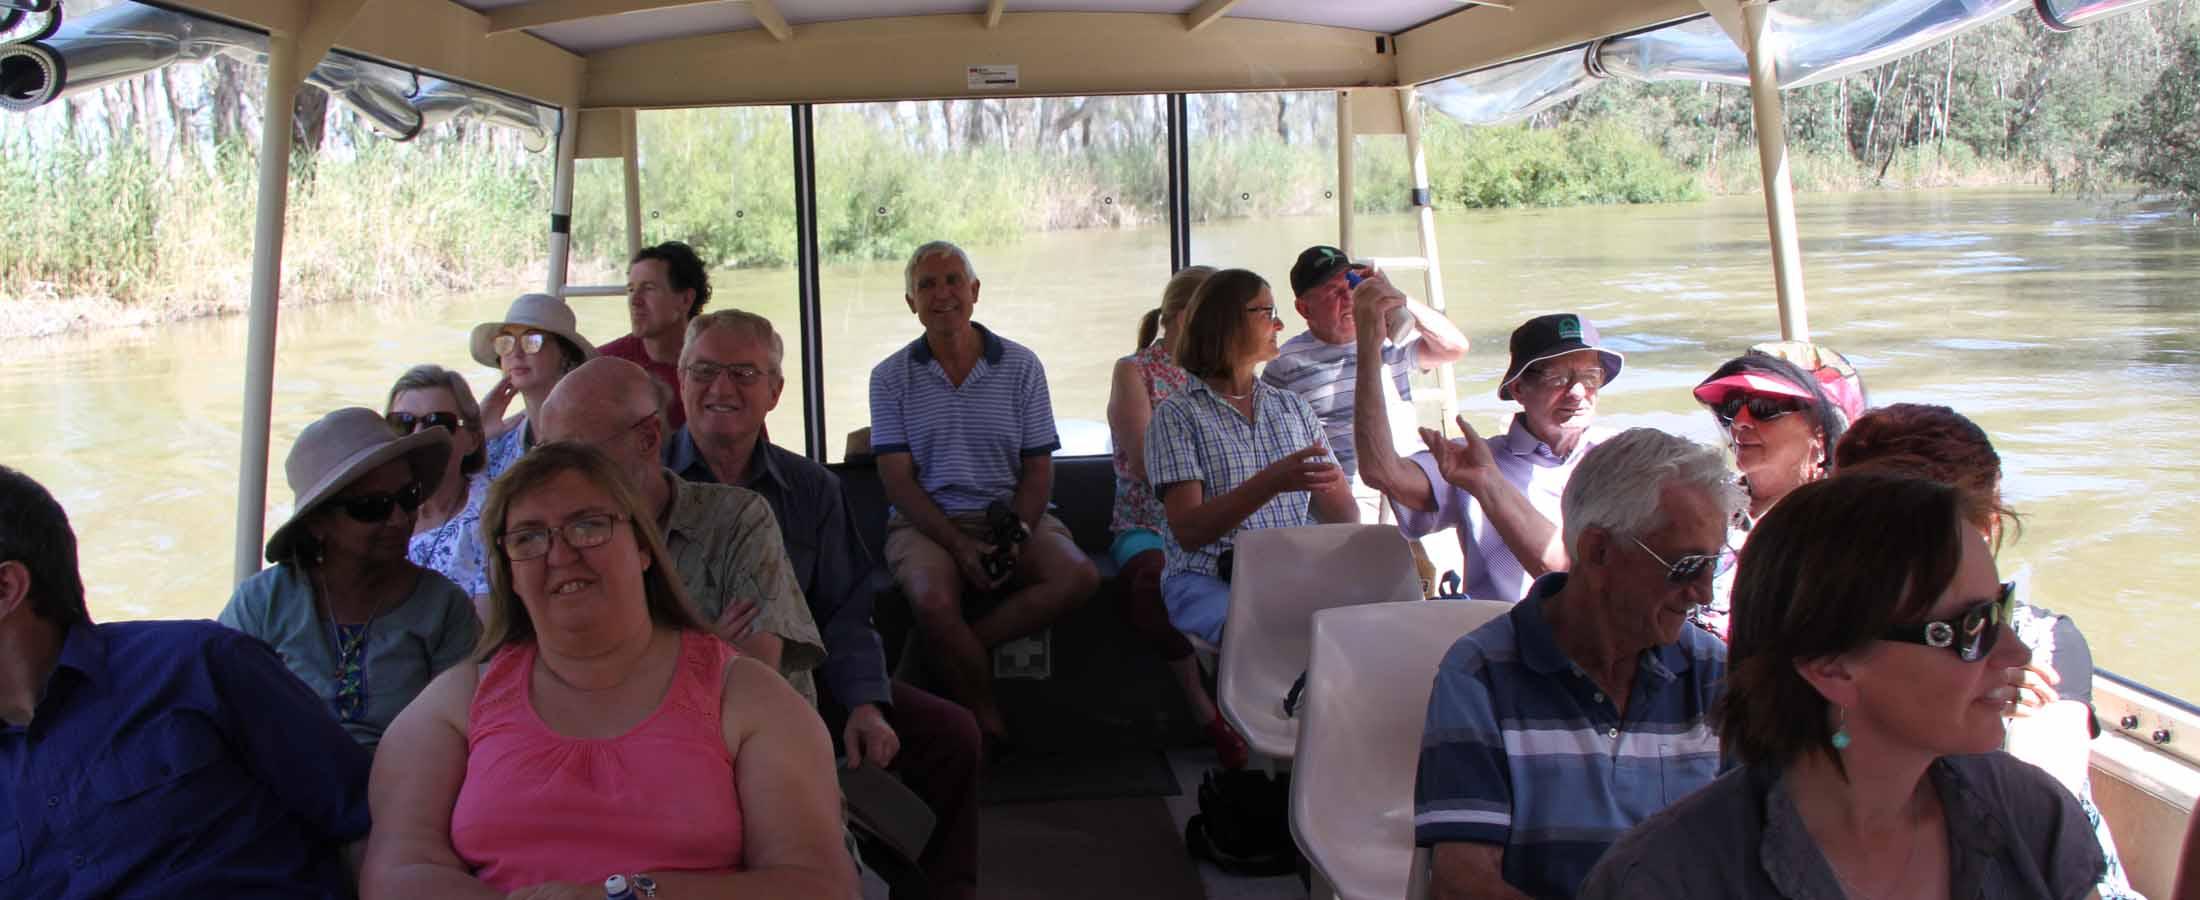 kingfisher river cruise